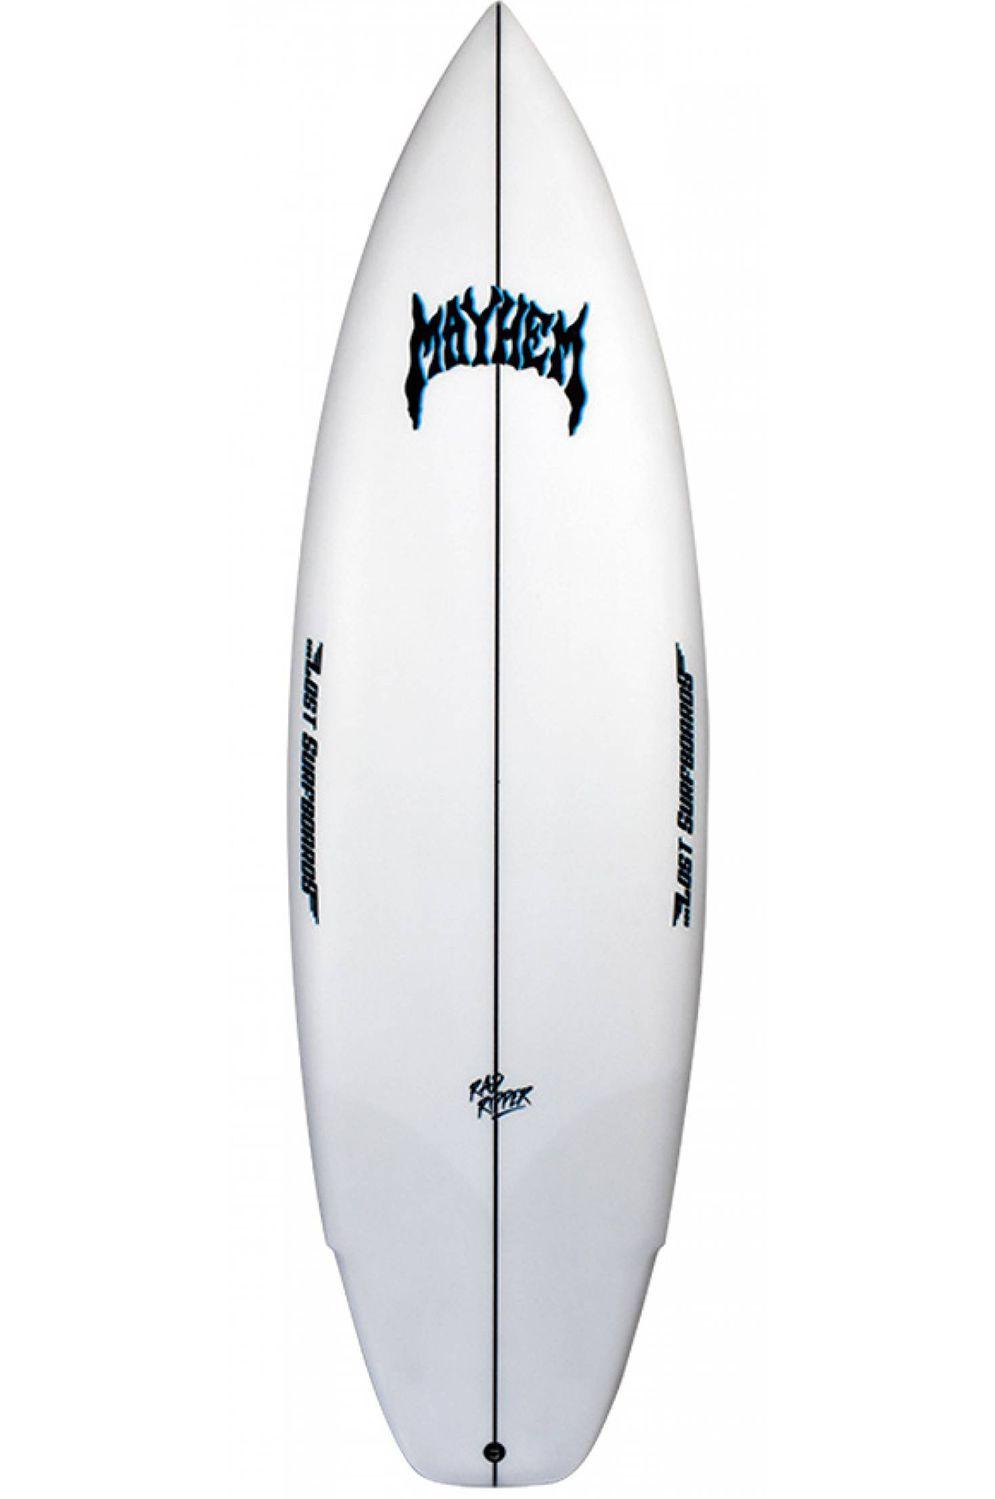 Lost Surf Board 5'10 RAD RIPPER Squash Tail - Color FCS II Multisystem 5ft10